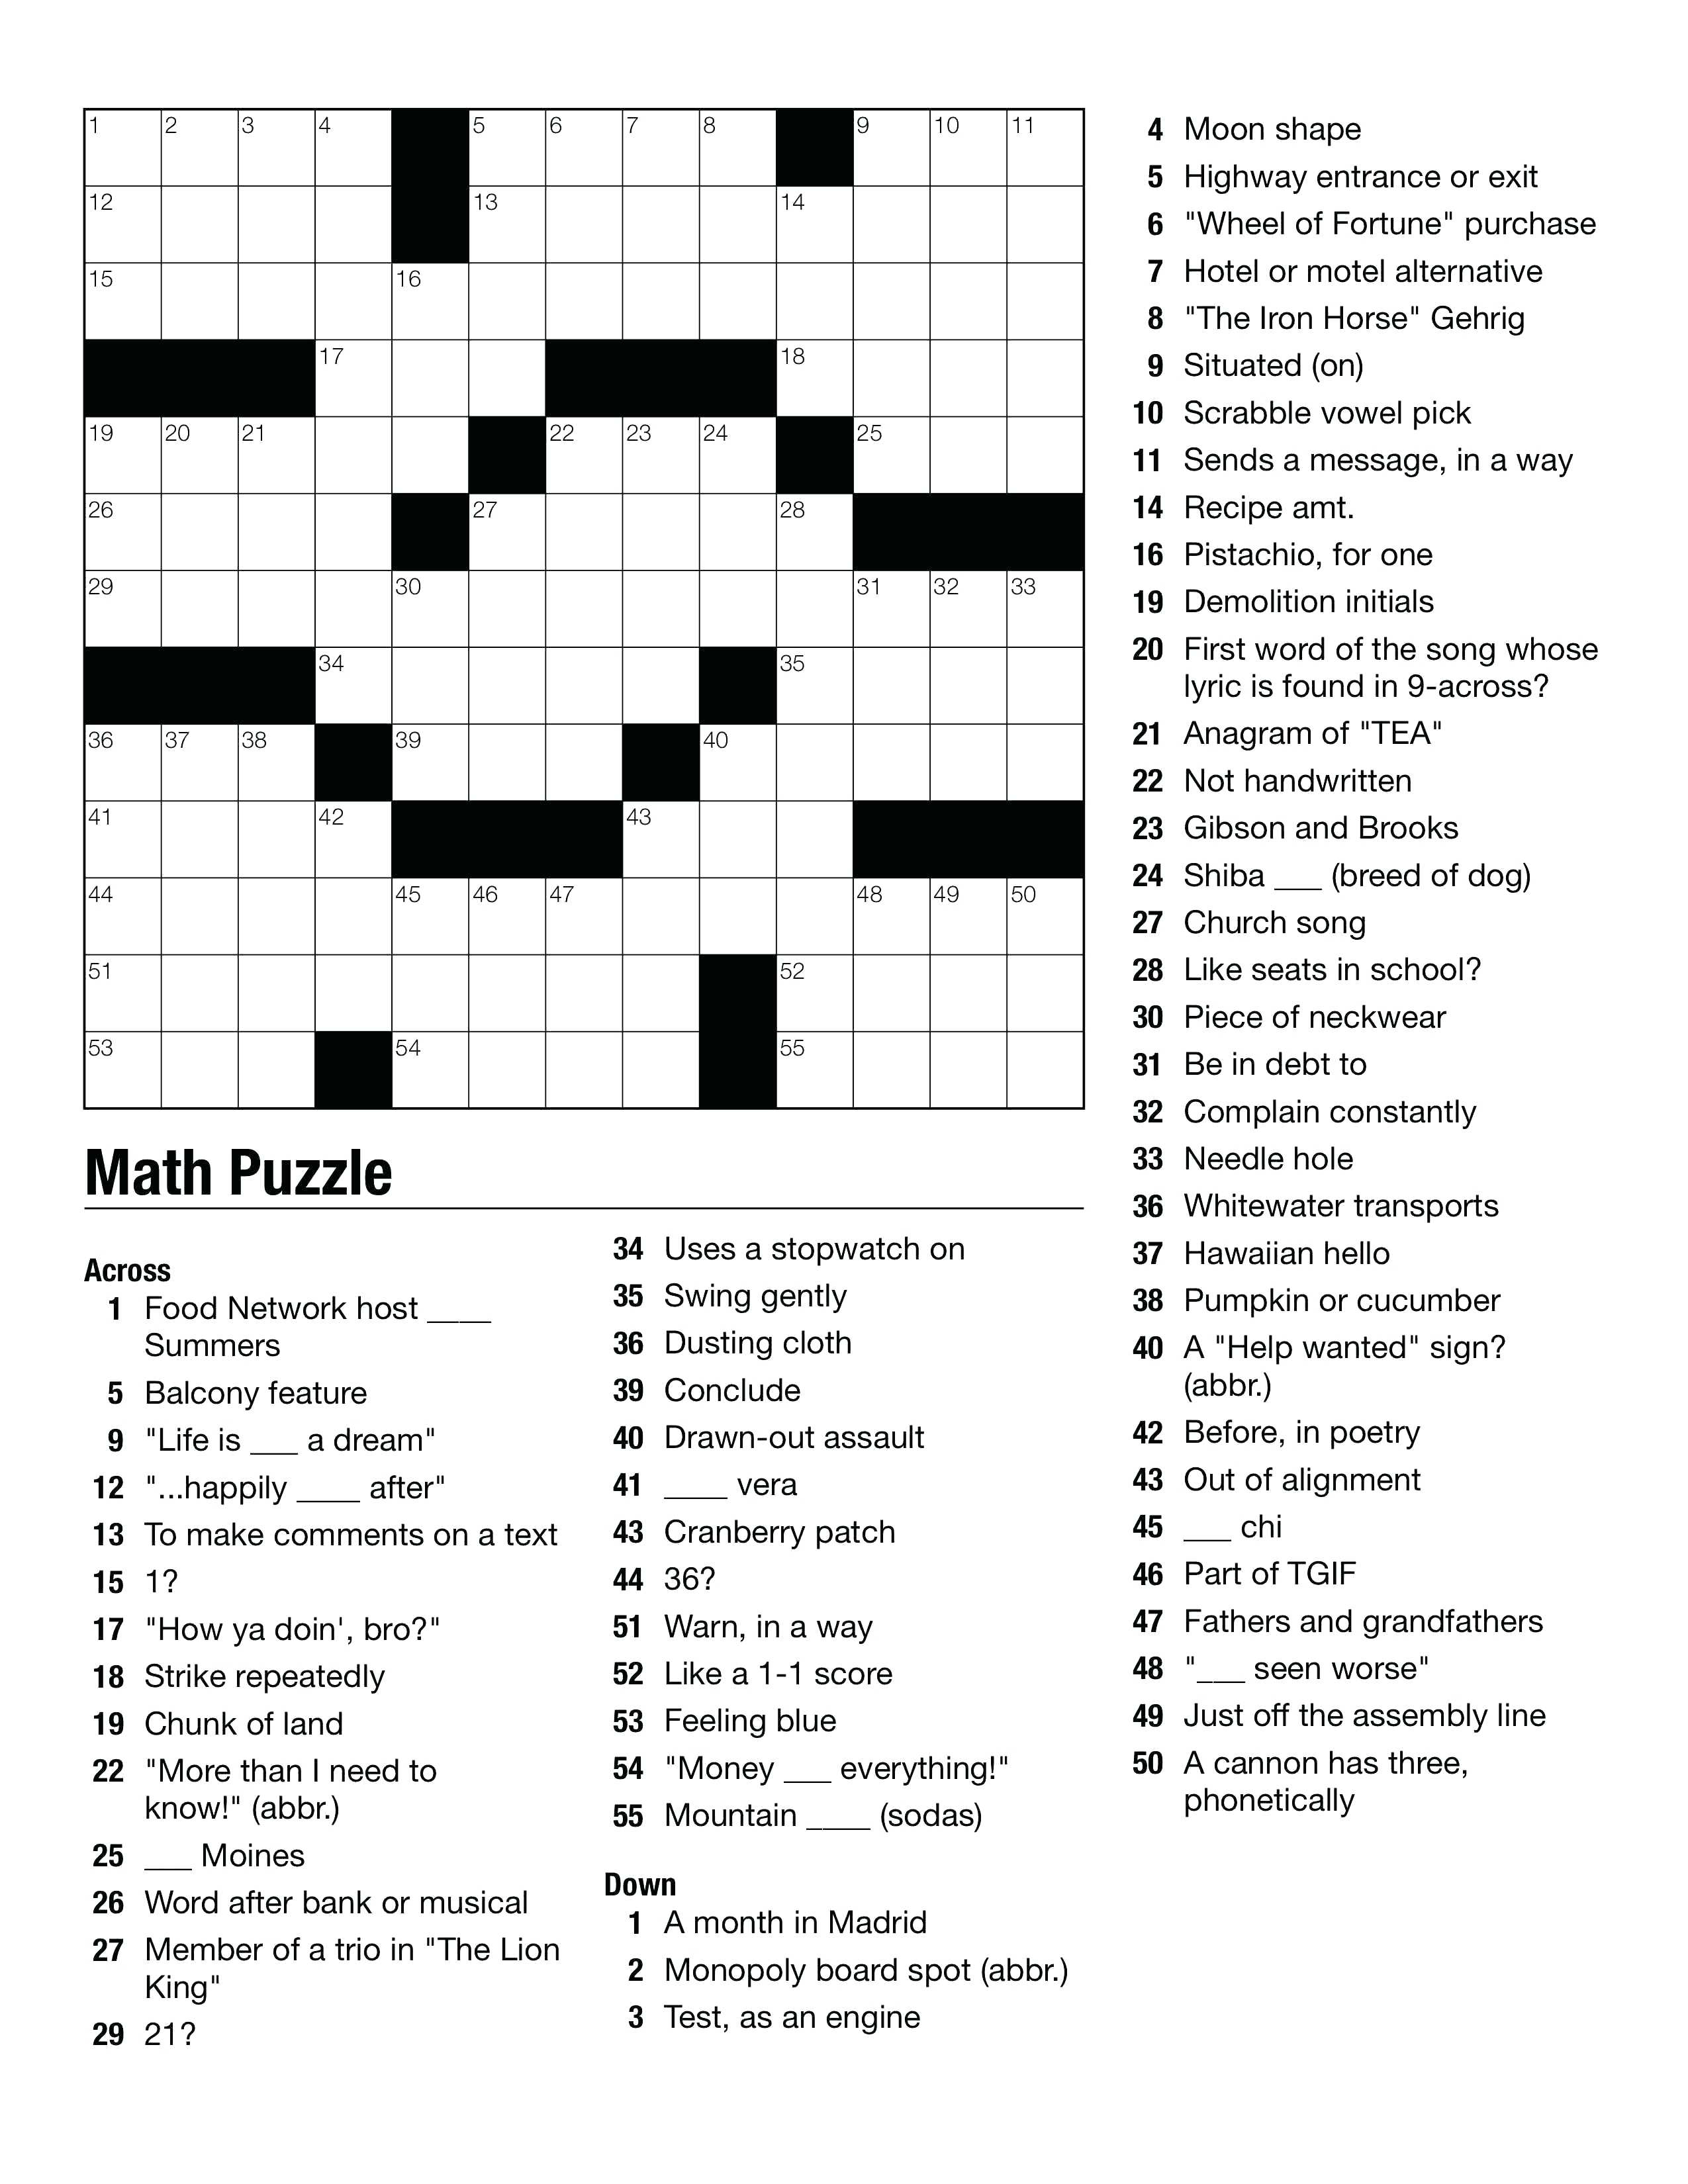 Geometry Puzzles Math – Upskill.club - Free Printable Crossword Puzzles High School